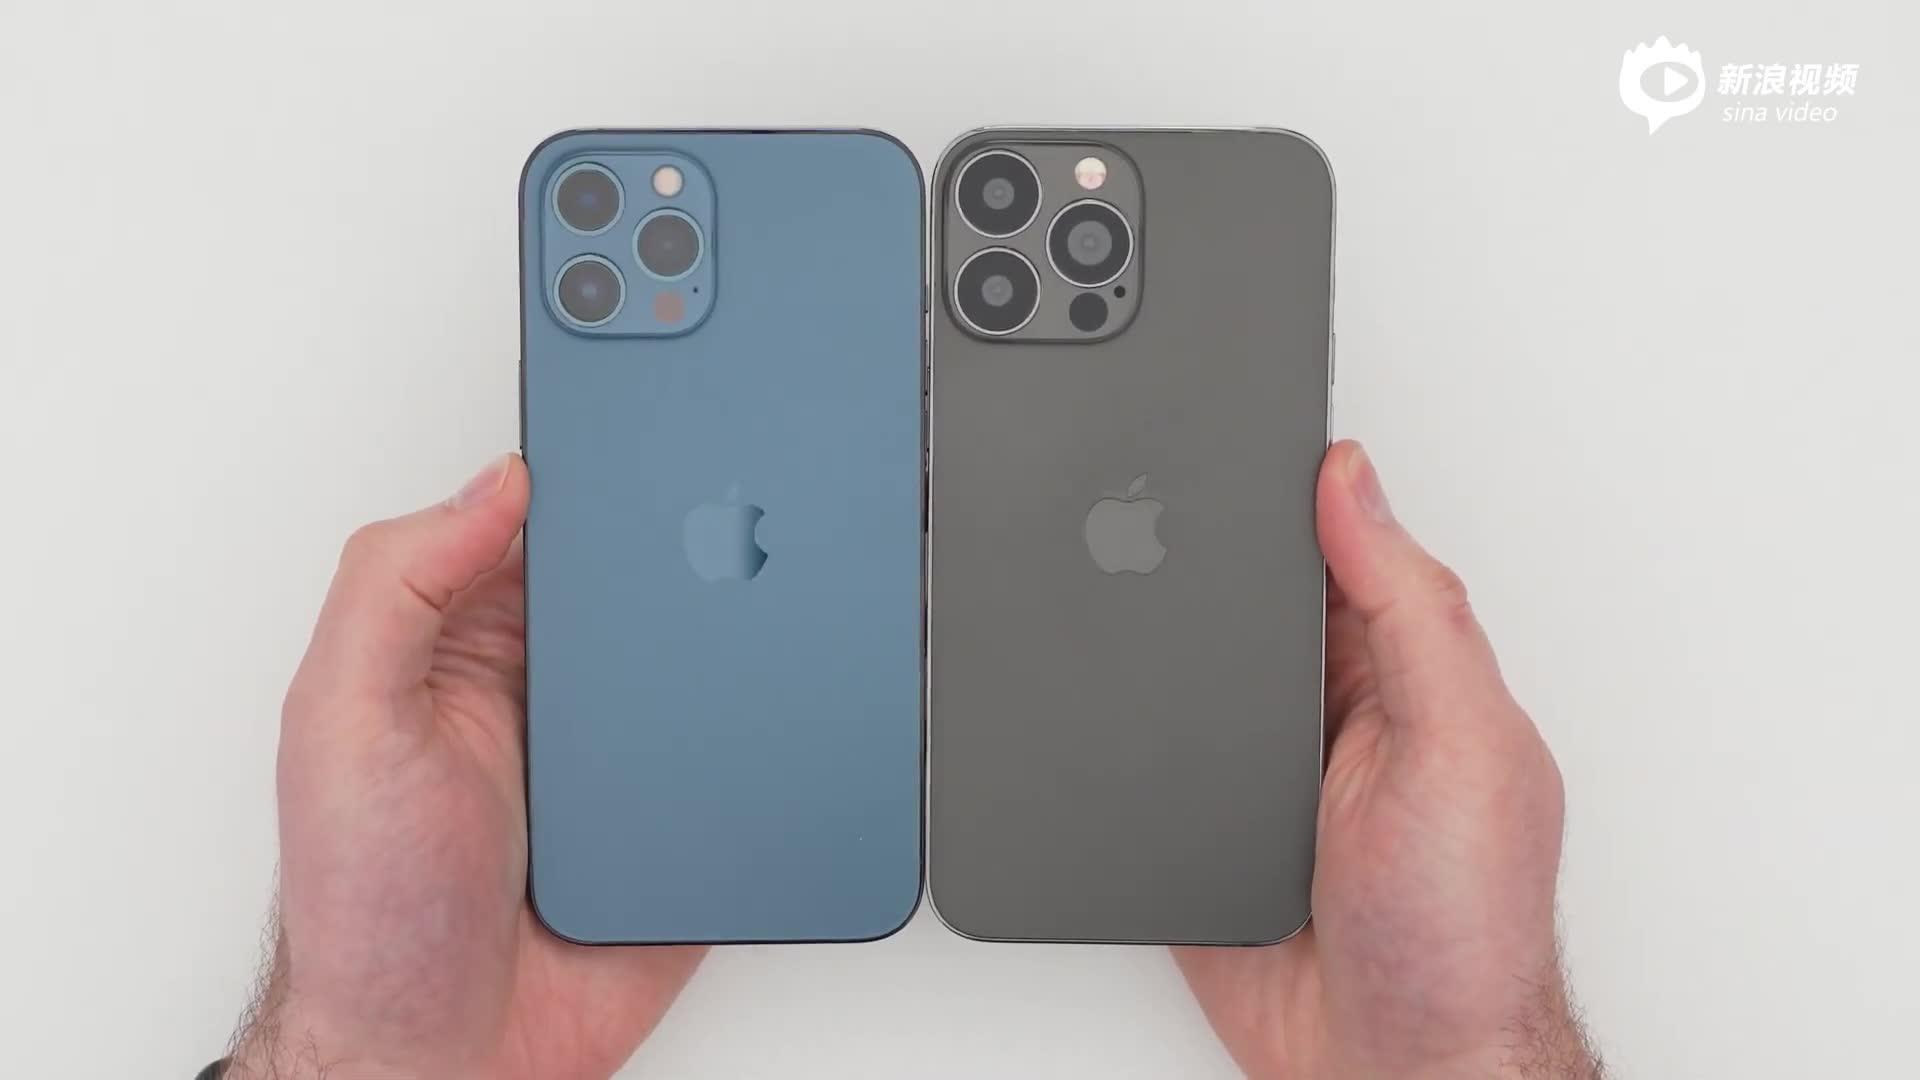 iPhone 13 Pro Max机模亮相:刘海更小 摄像头更大